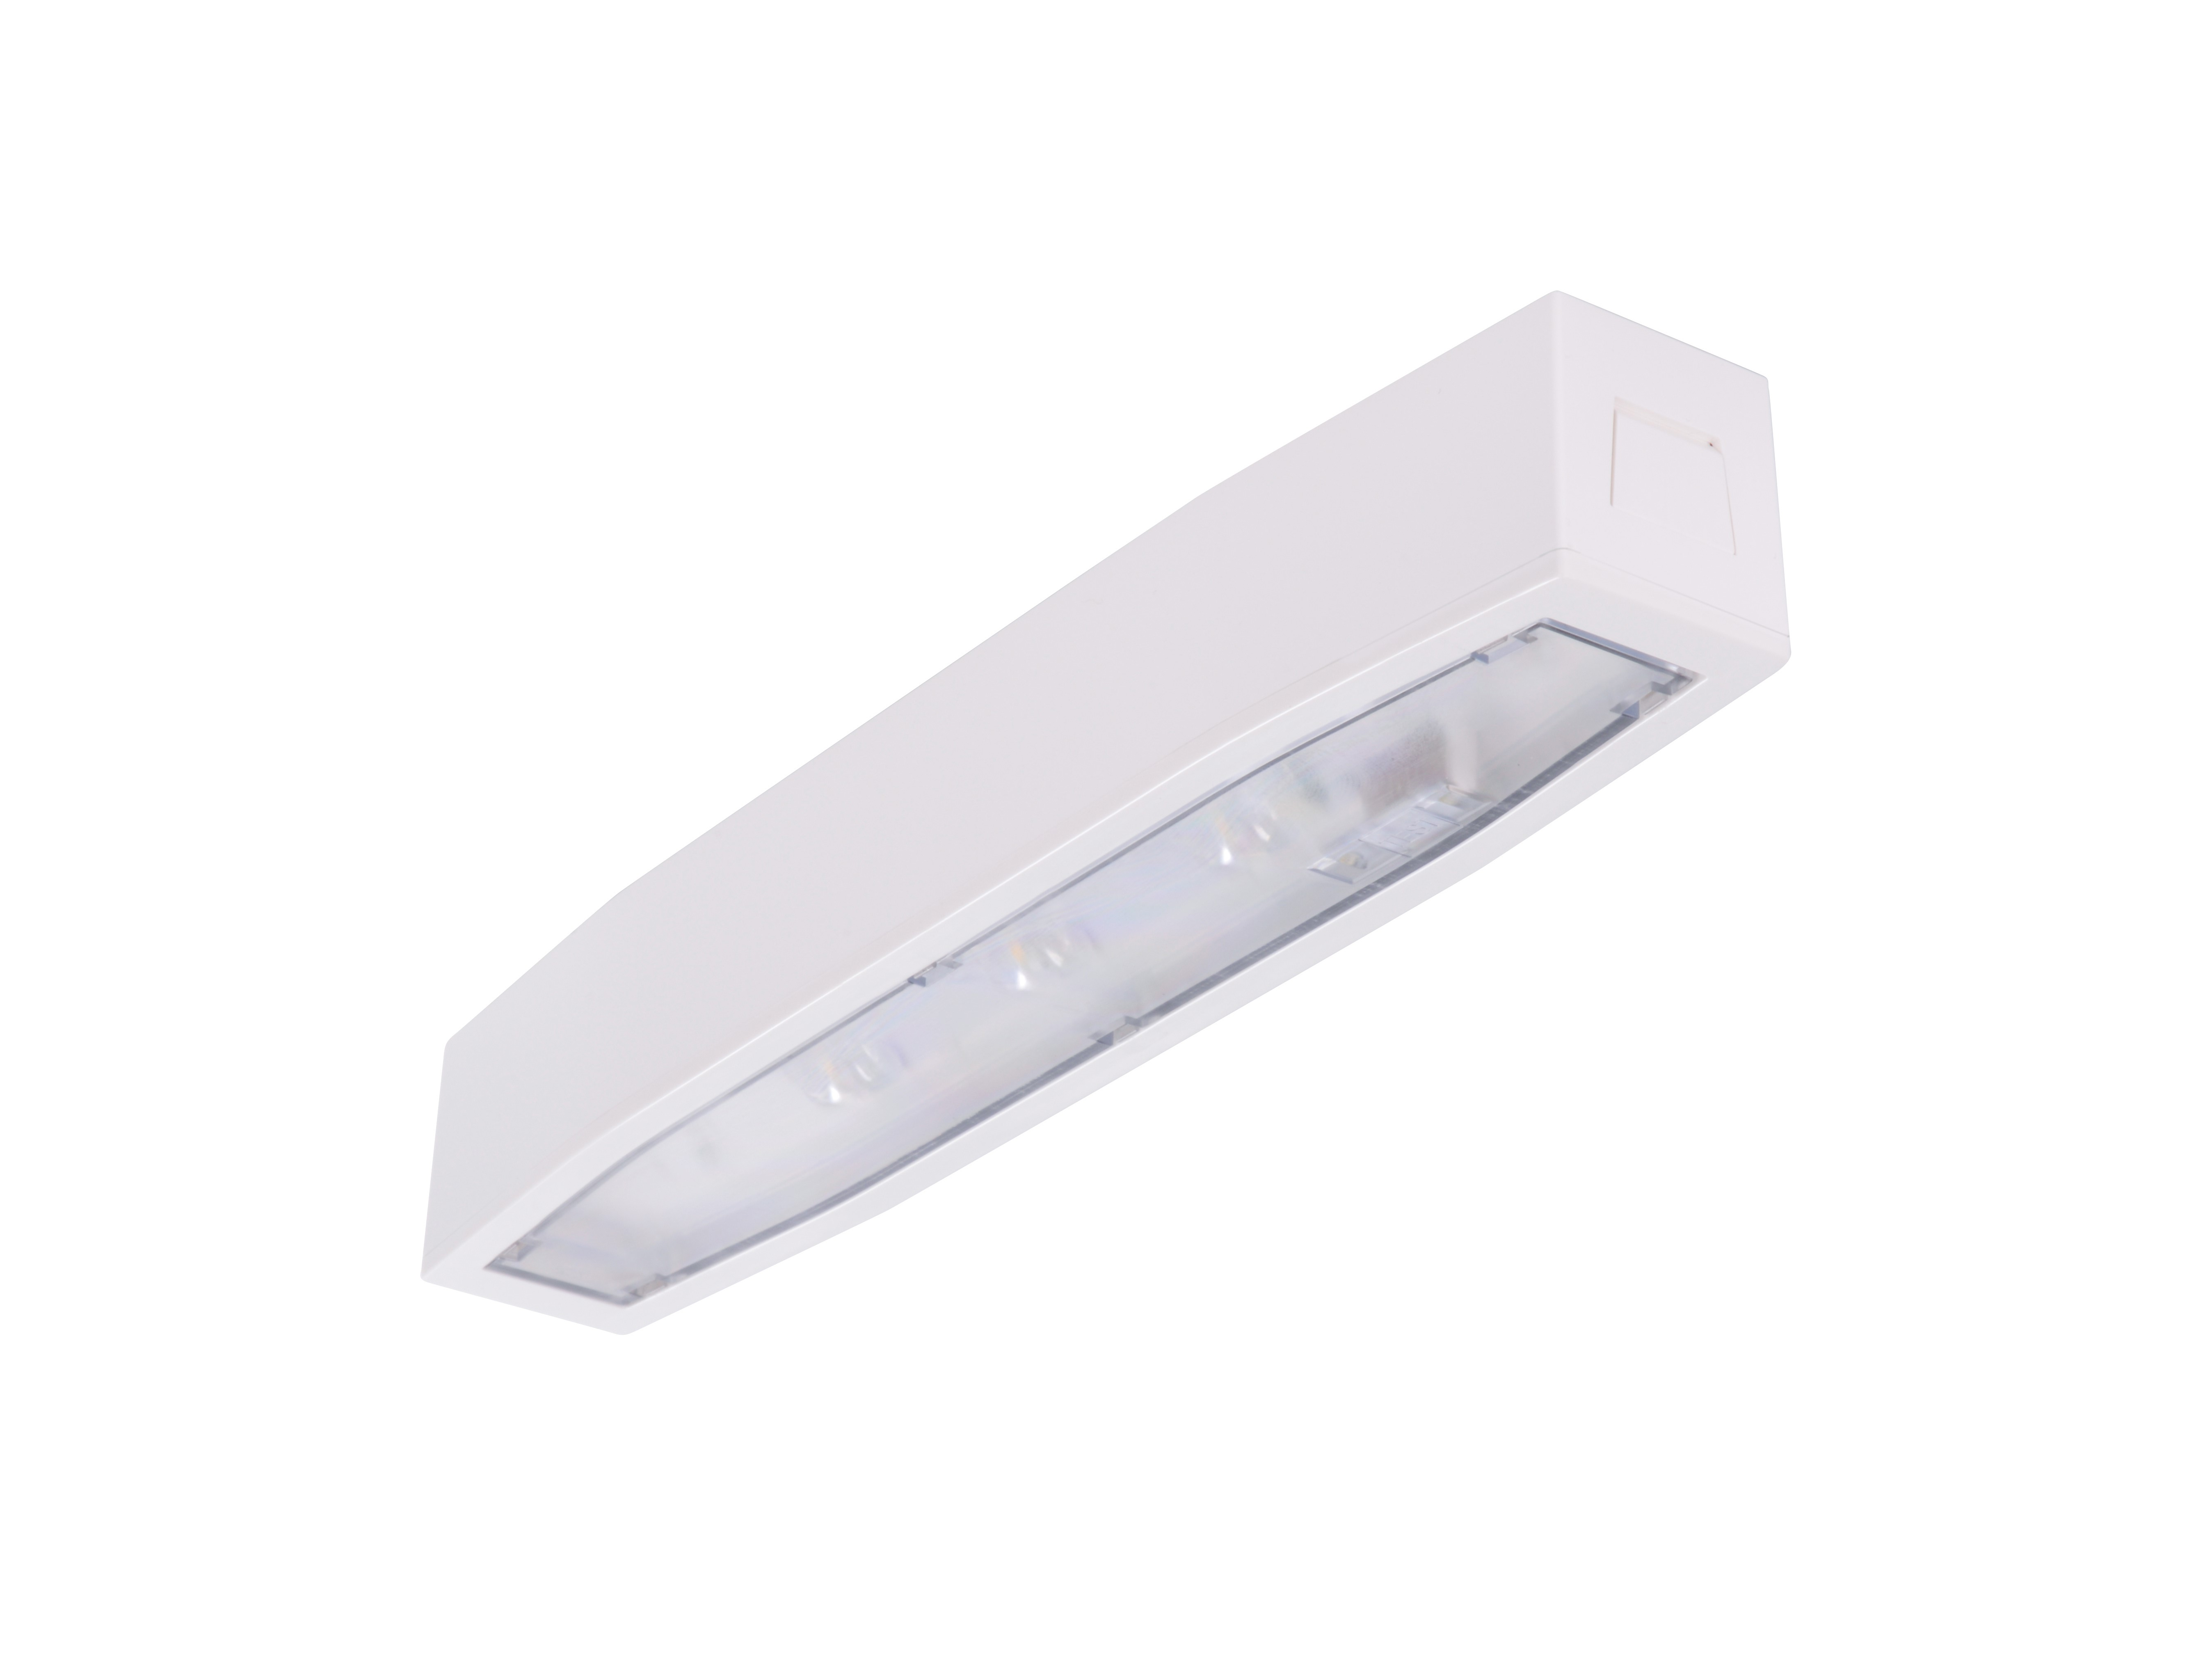 Lampa antipanica led Intelight 94752   3h mentinut test automat 5